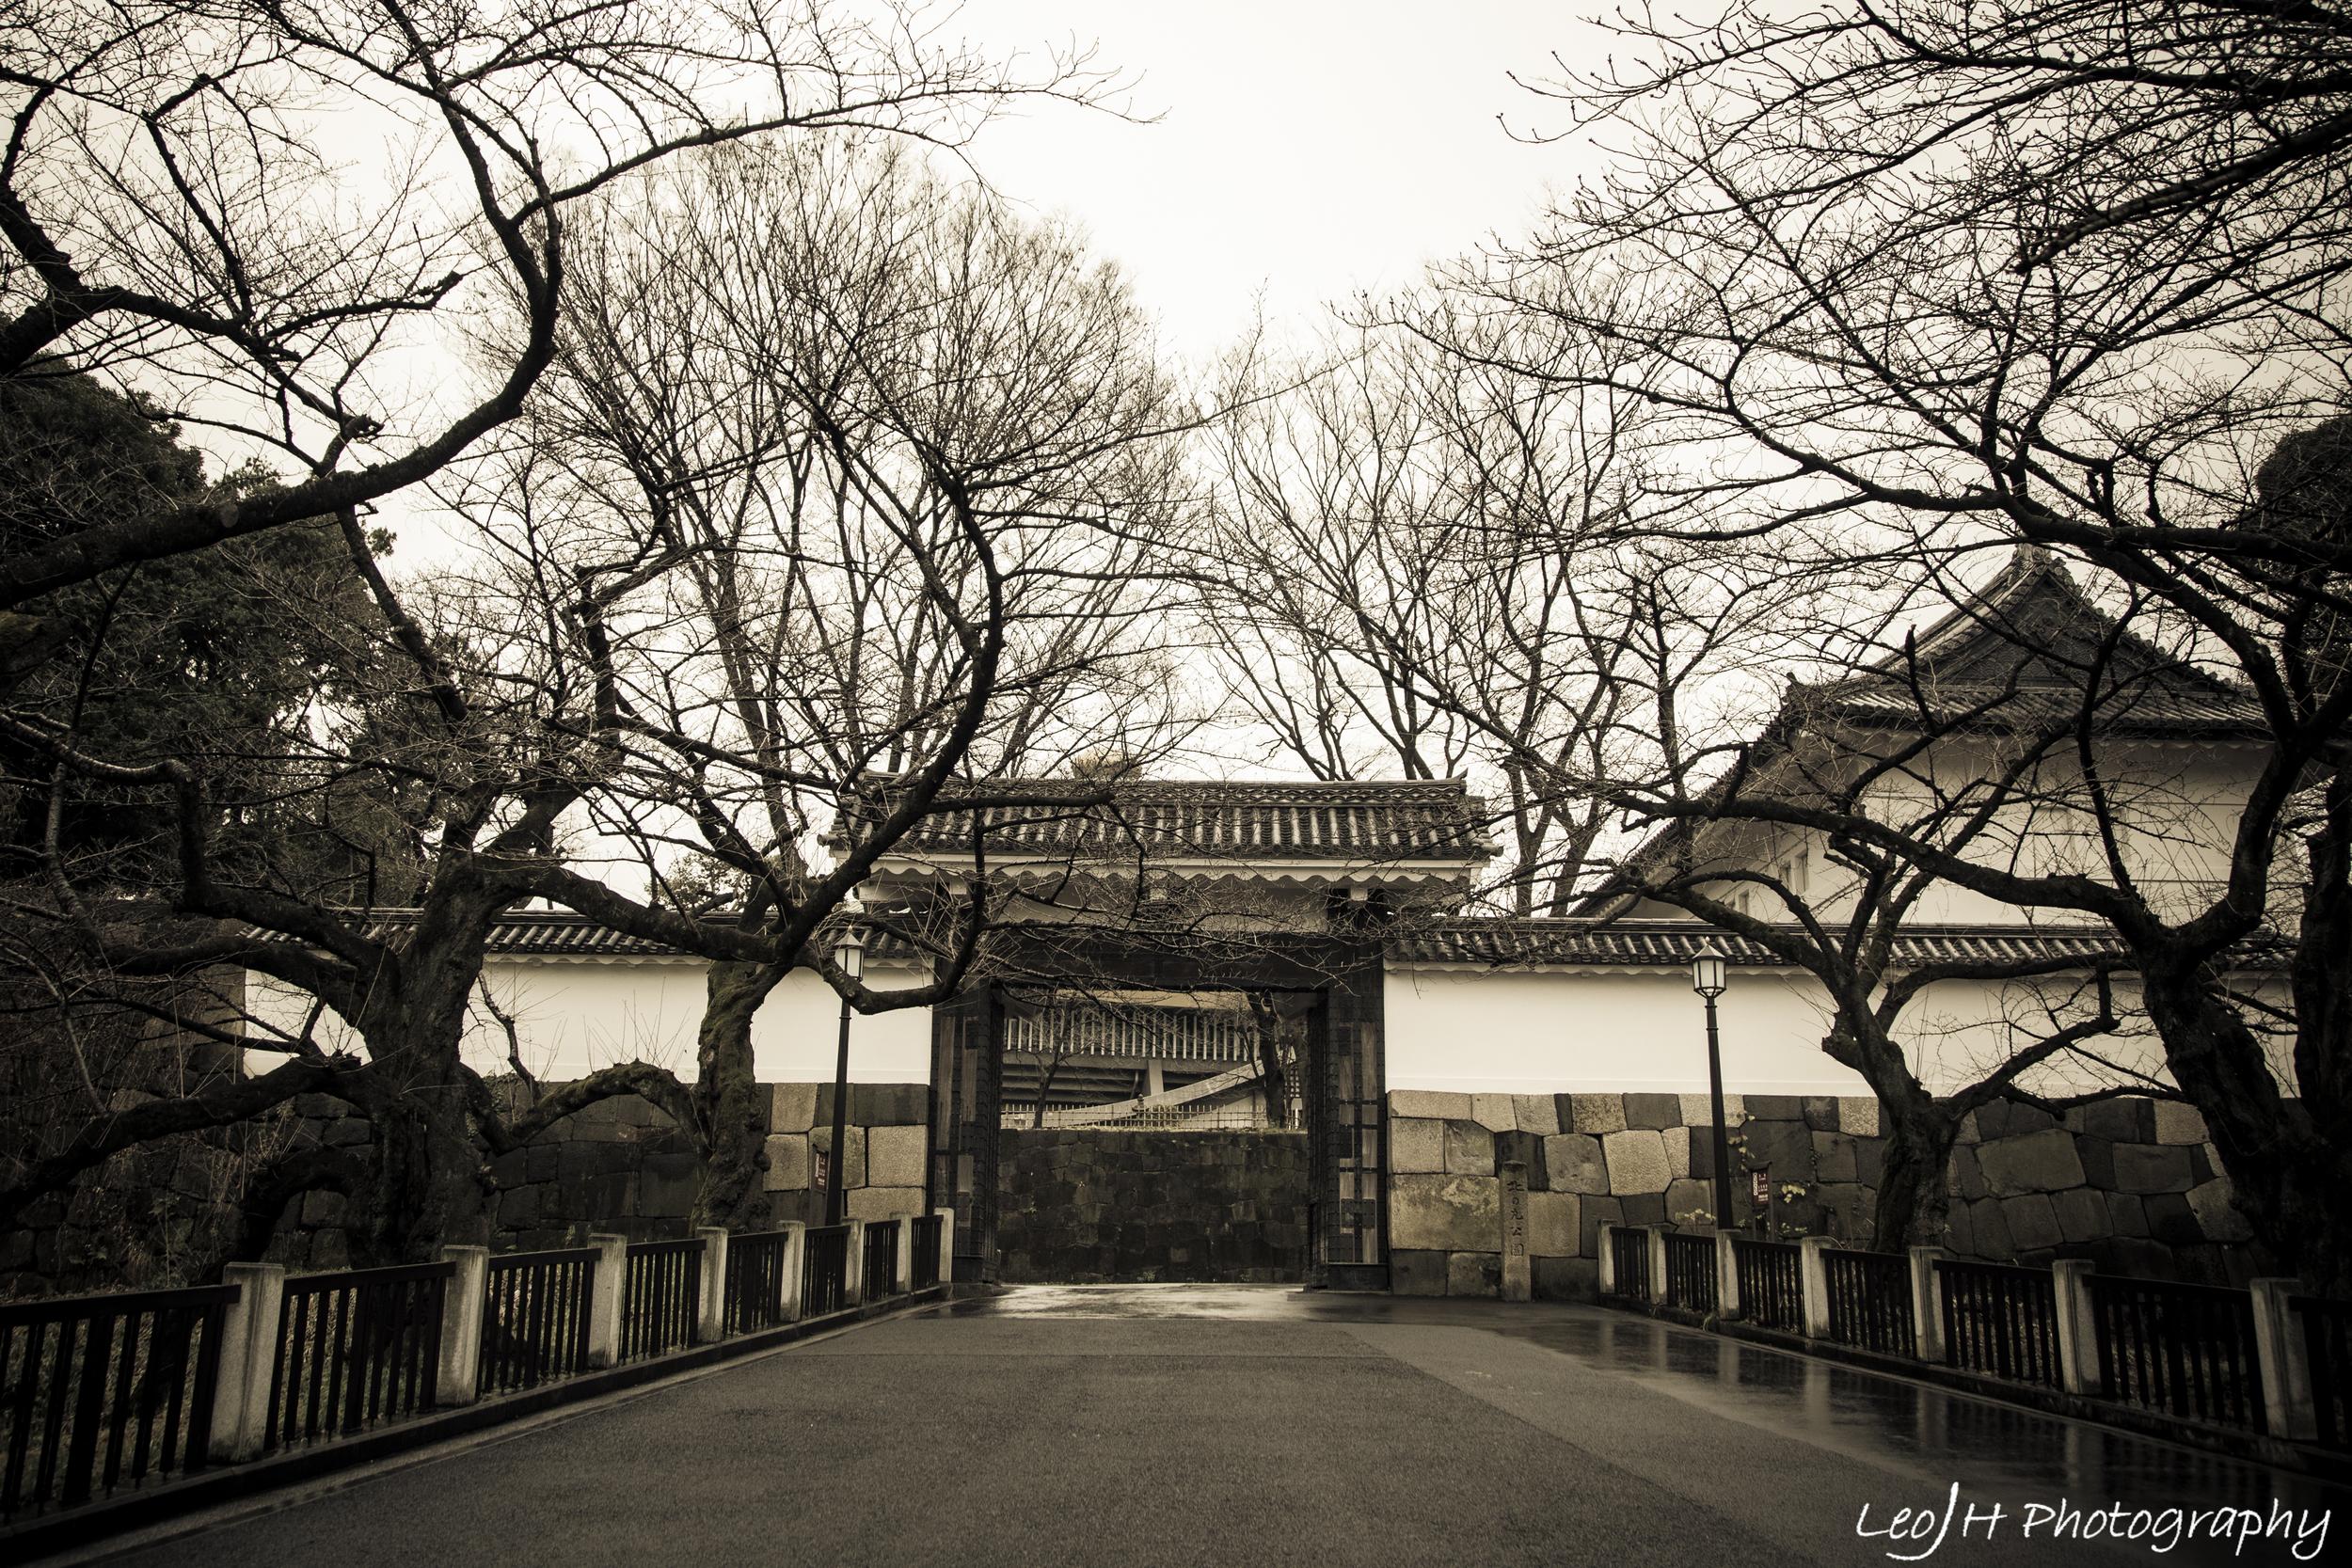 Entrance towards the Budokan area